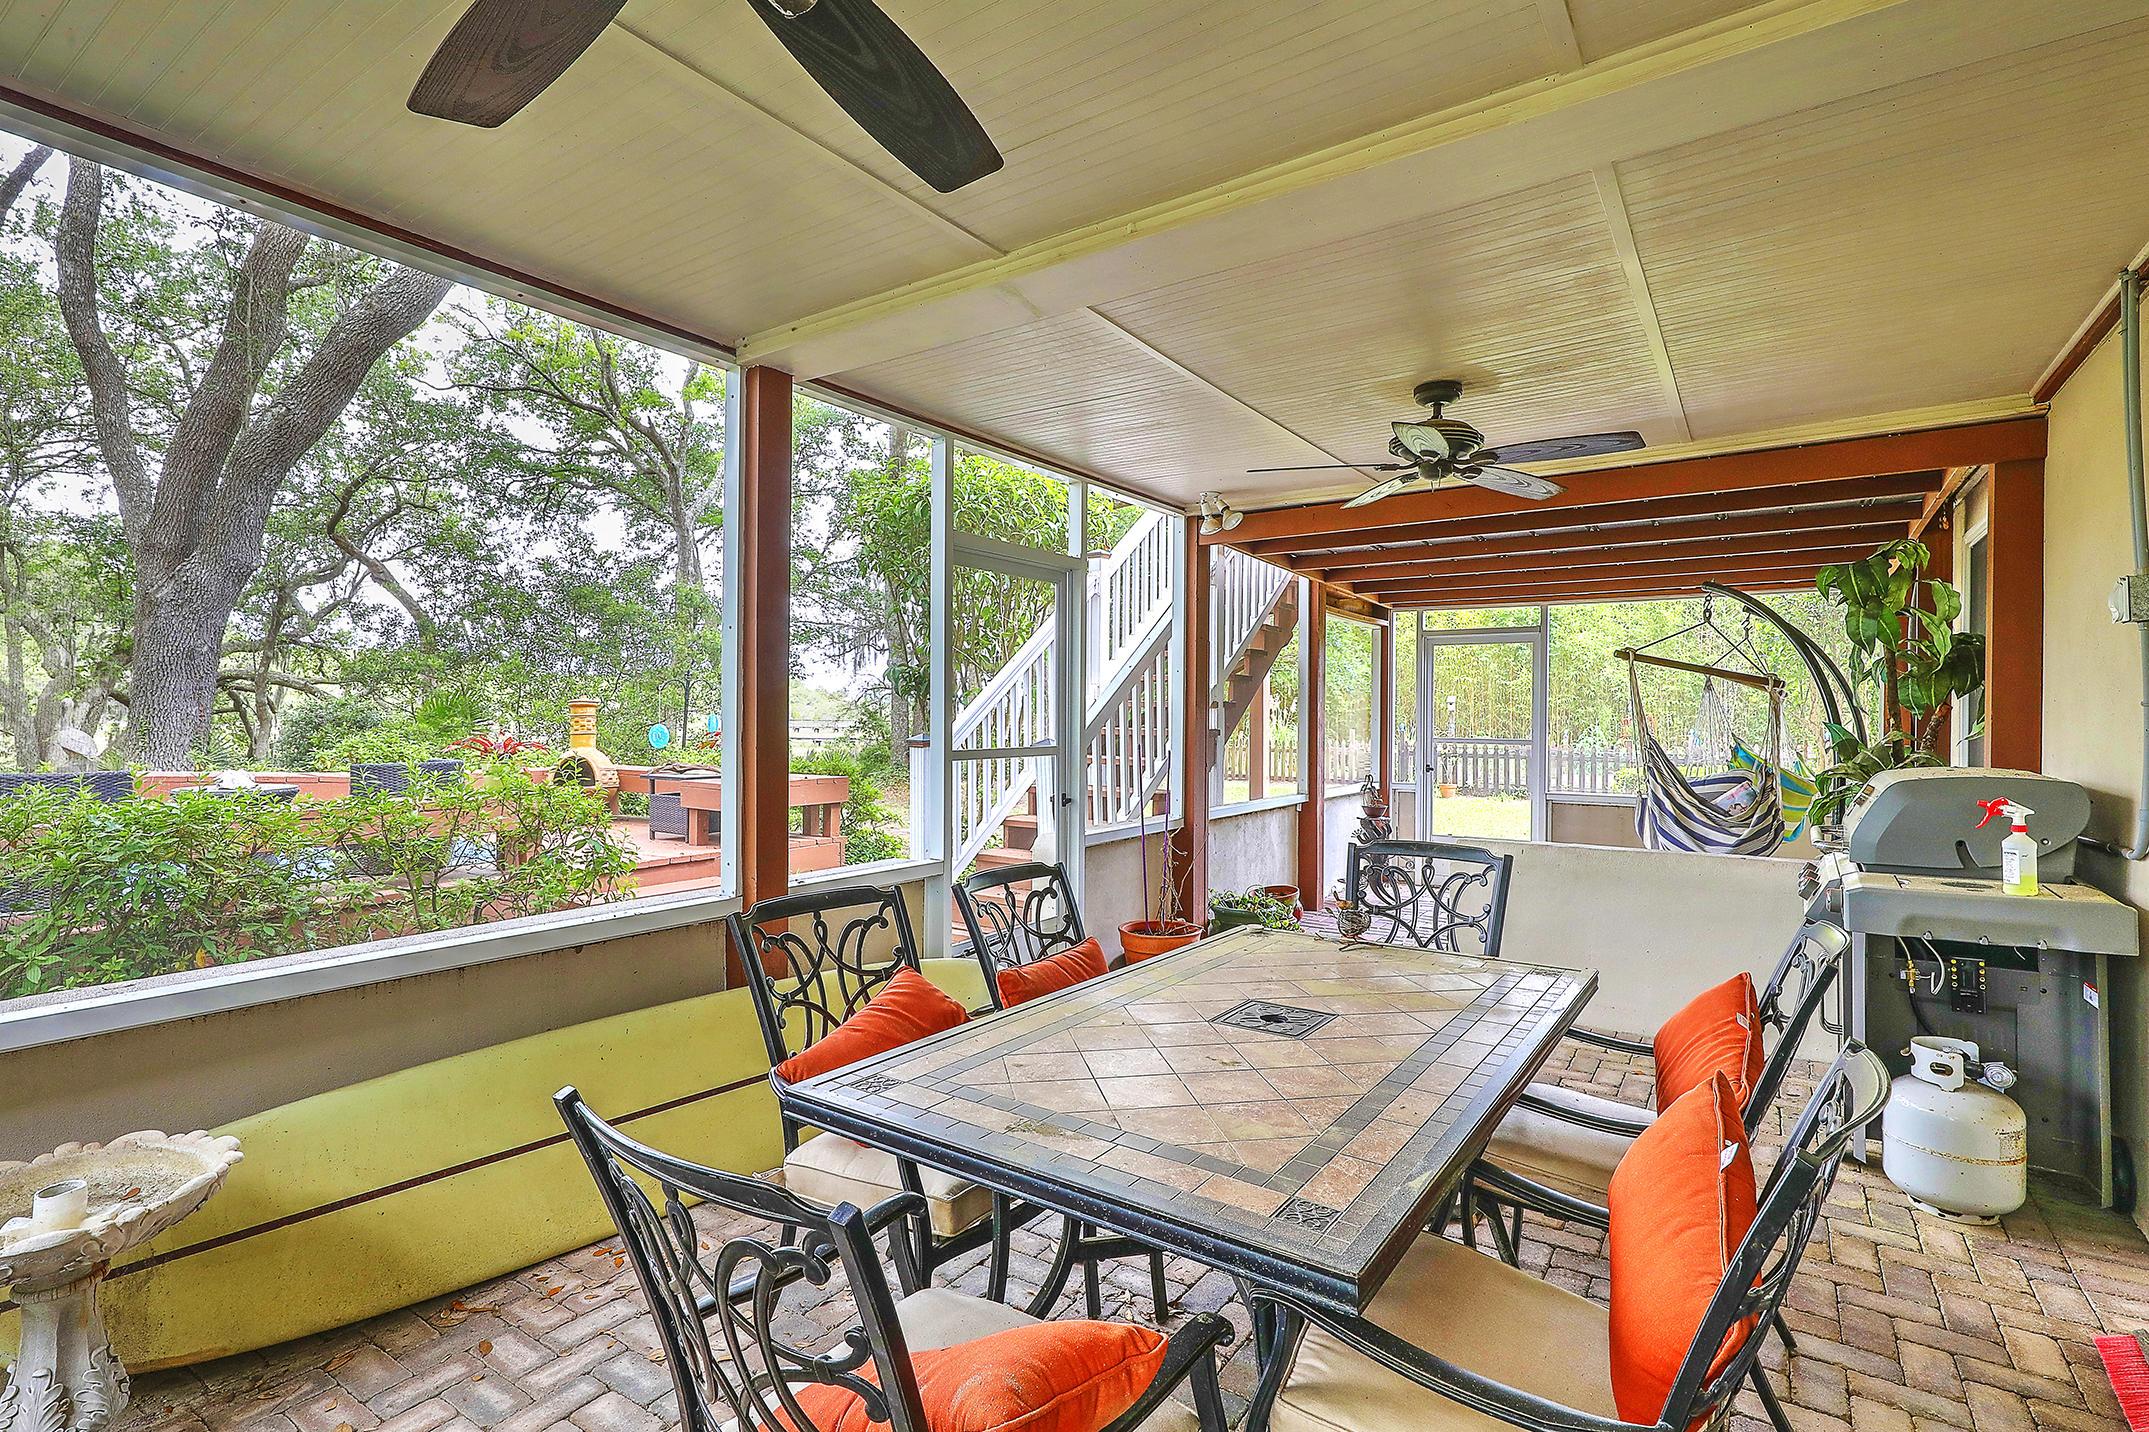 Stono Pointe Homes For Sale - 2660 Burden Creek, Johns Island, SC - 17